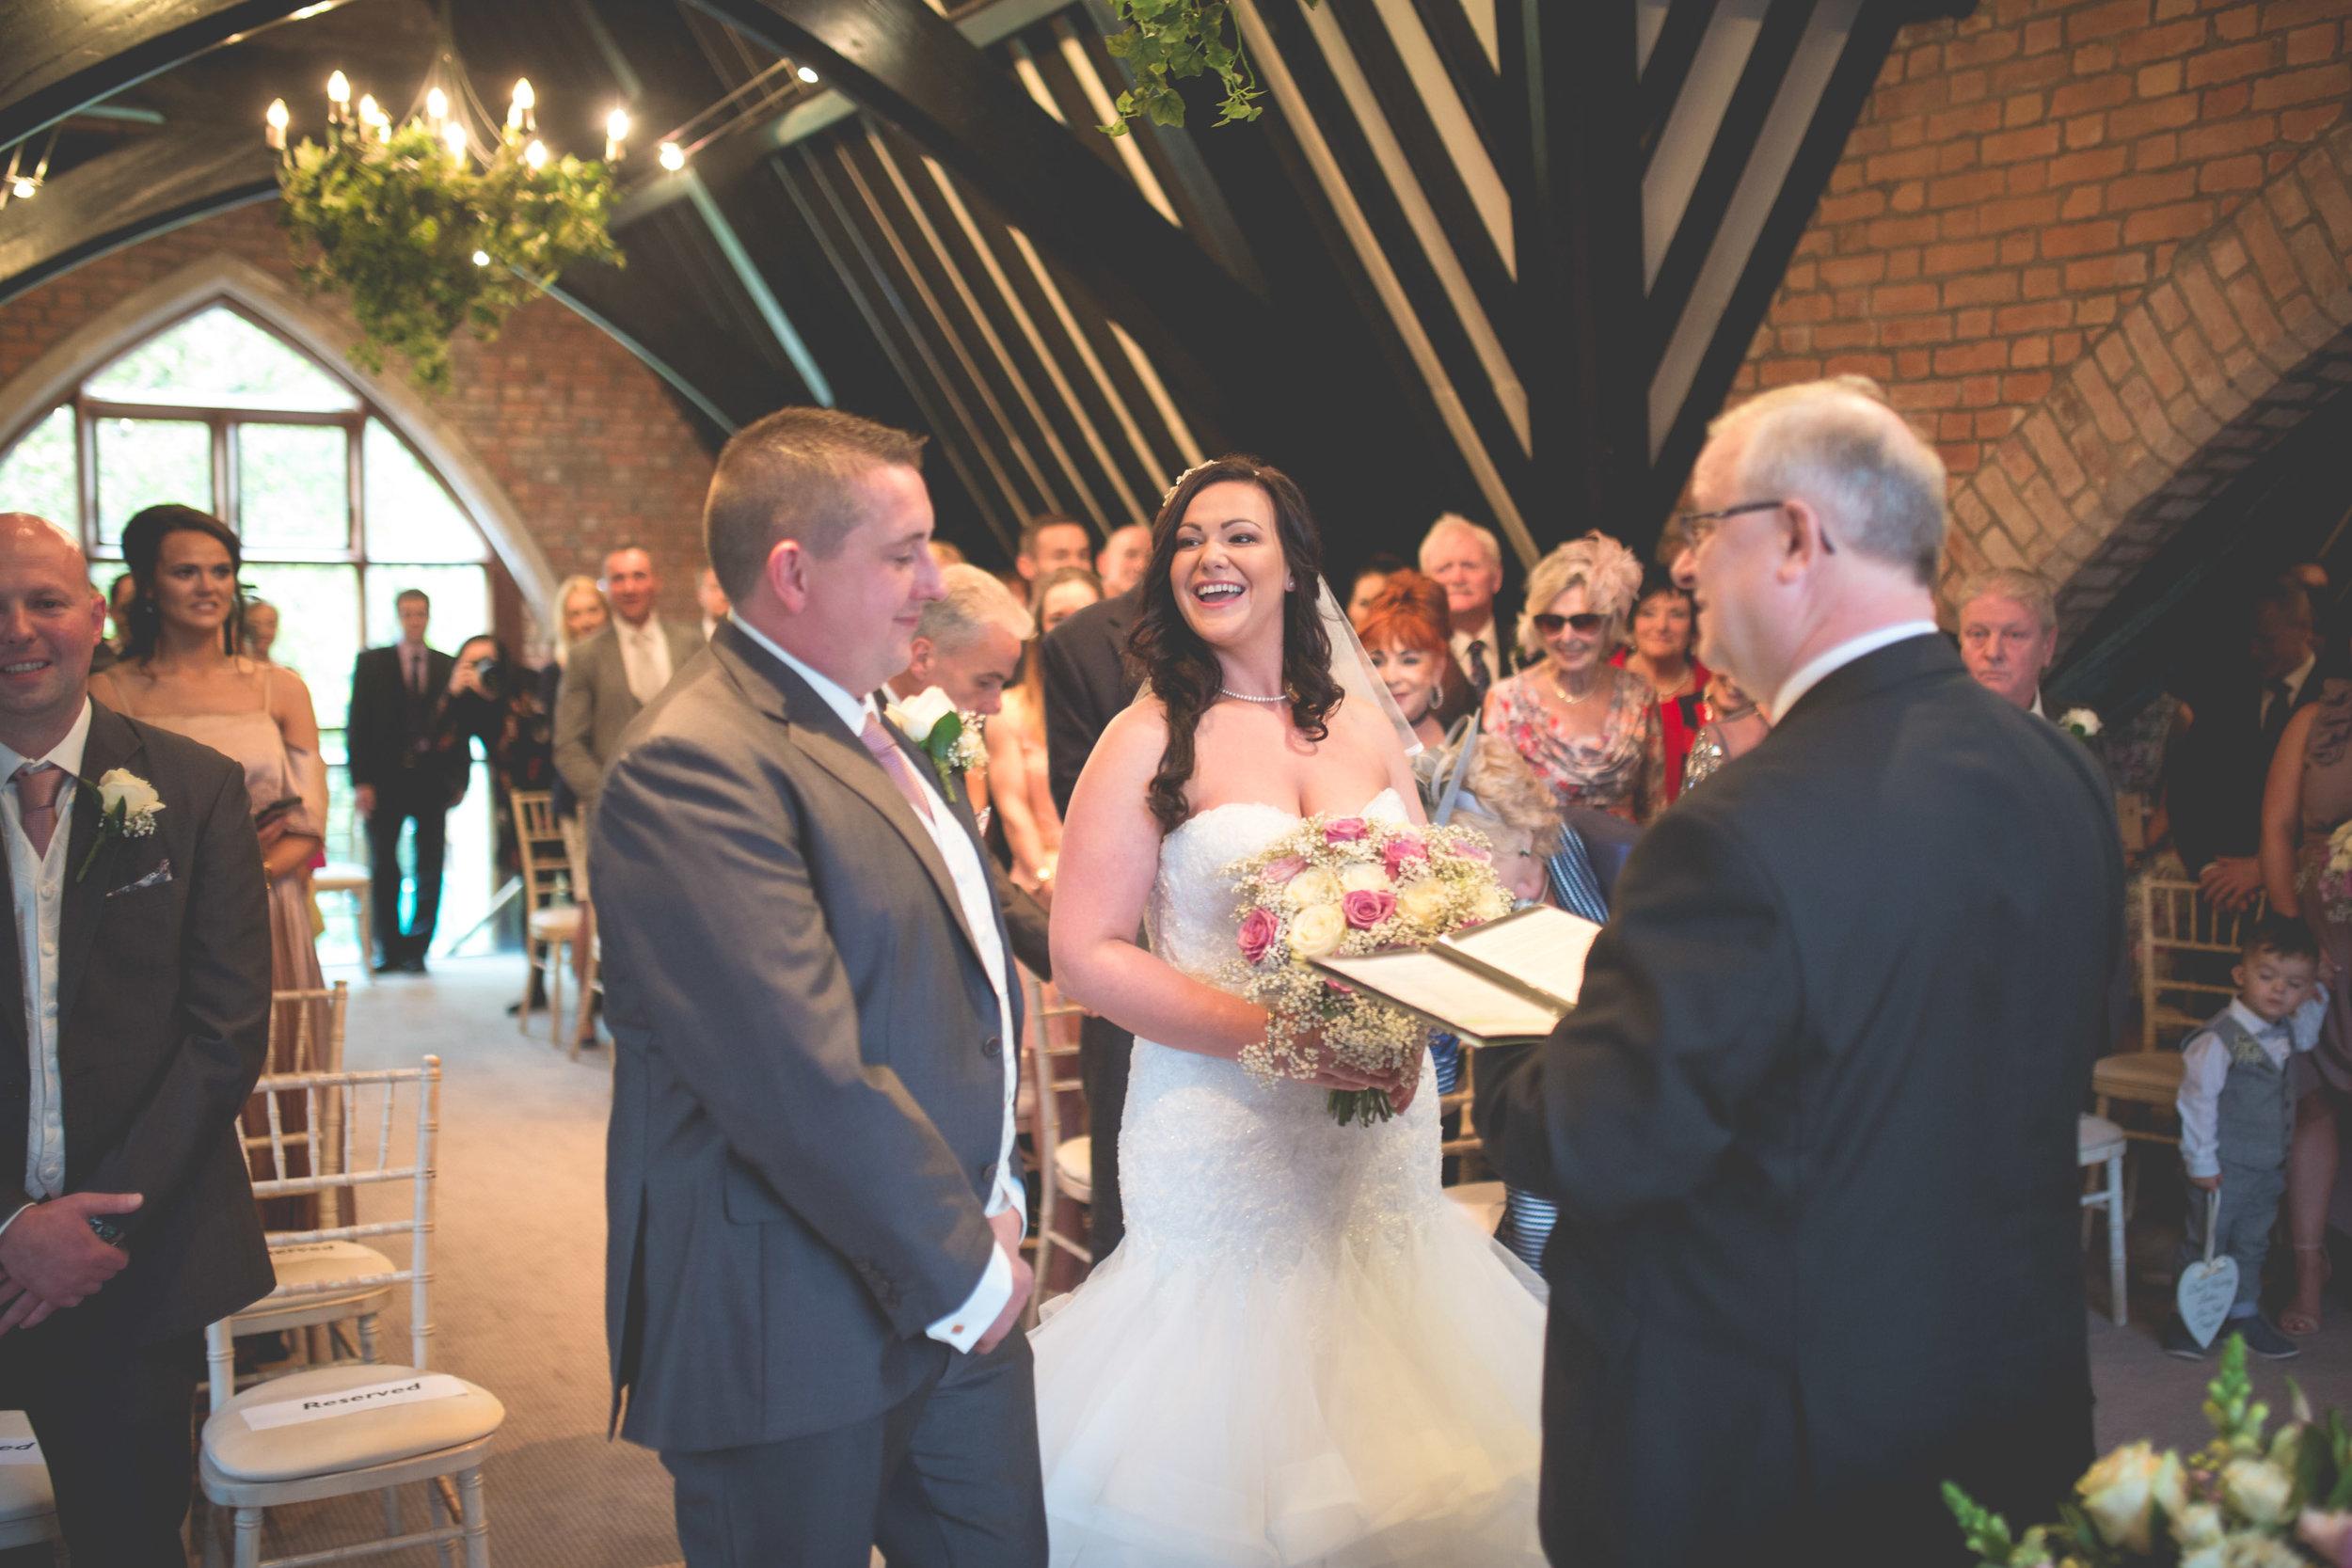 Helena & Terence - Ceremony-25.jpg